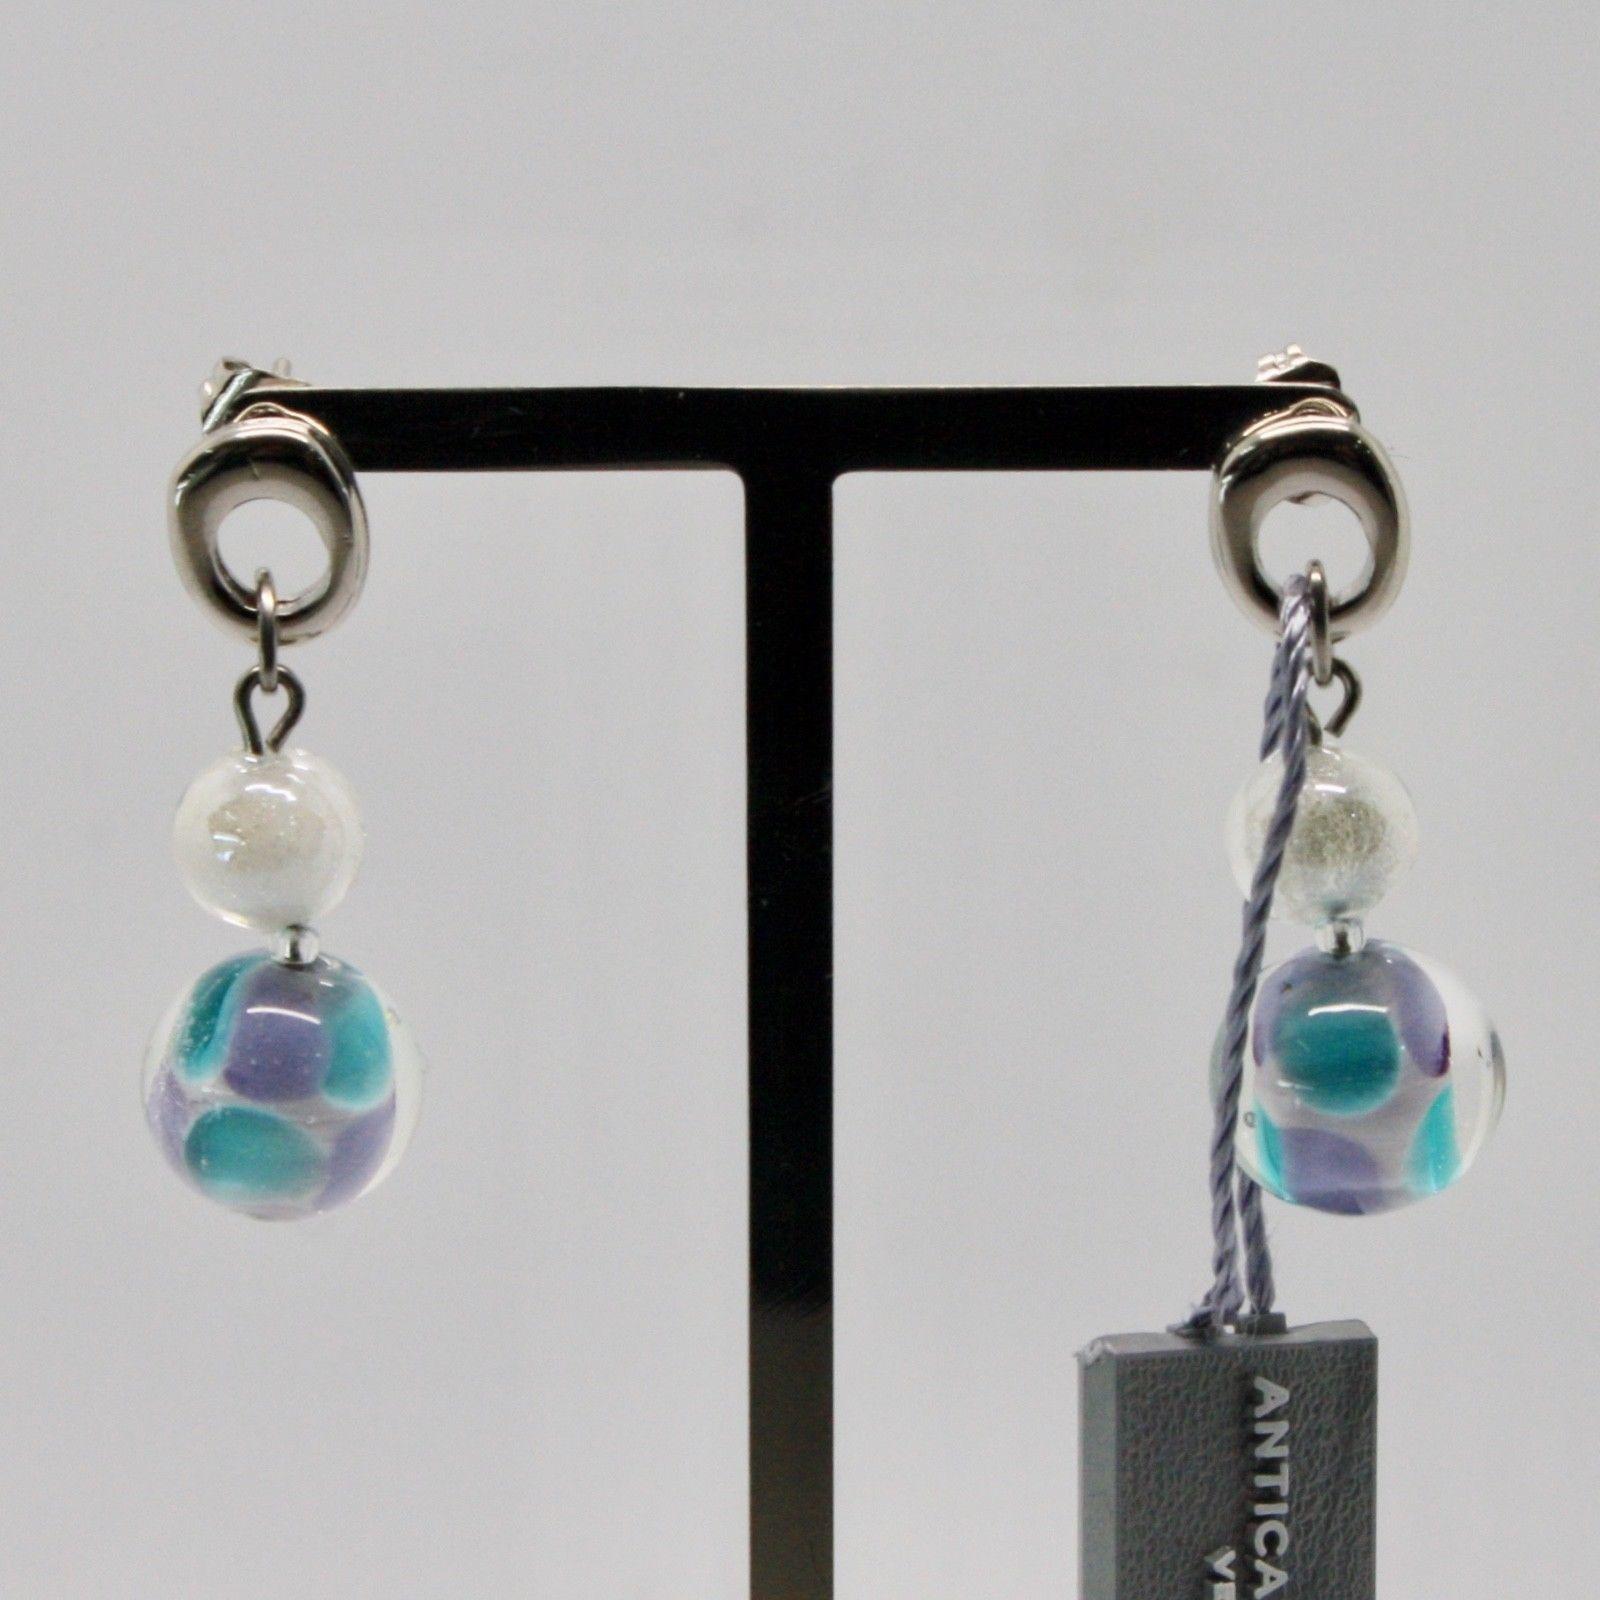 EARRINGS ANTICA MURRINA VENEZIA WITH MURANO GLASS BLUE GREY PURPLE OR588A07